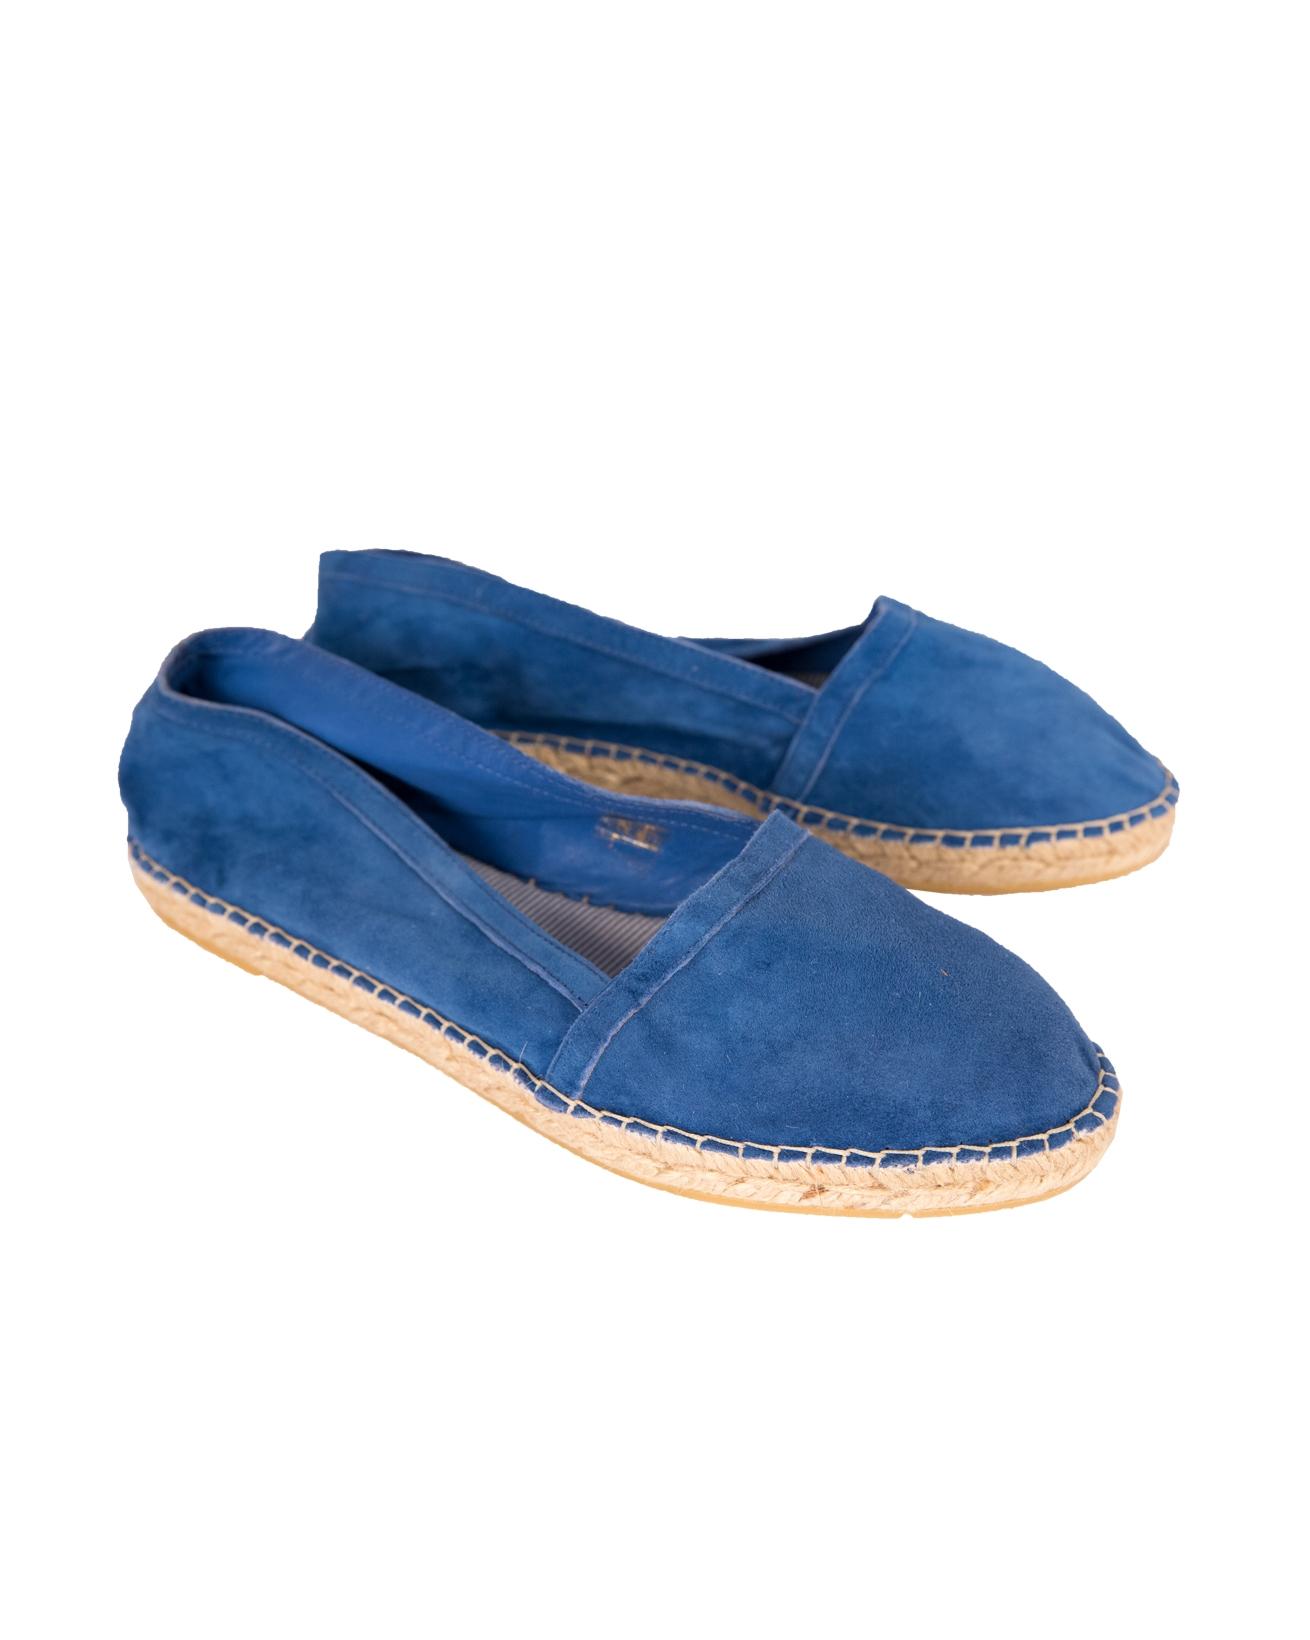 Flat Espadrille - Size 41 - Blue suede - 57b